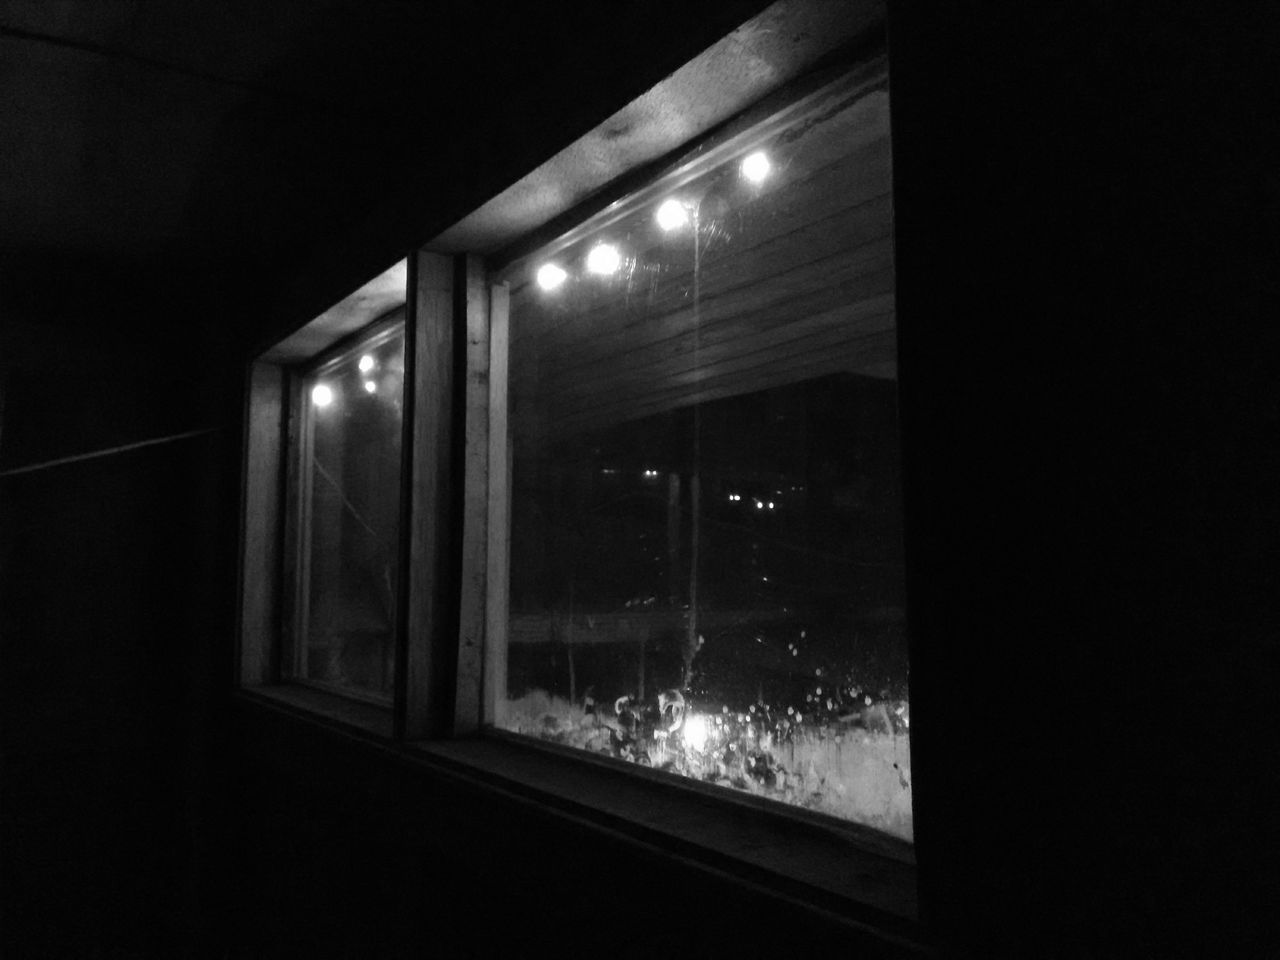 illuminated, night, indoors, window, dark, no people, architecture, nature